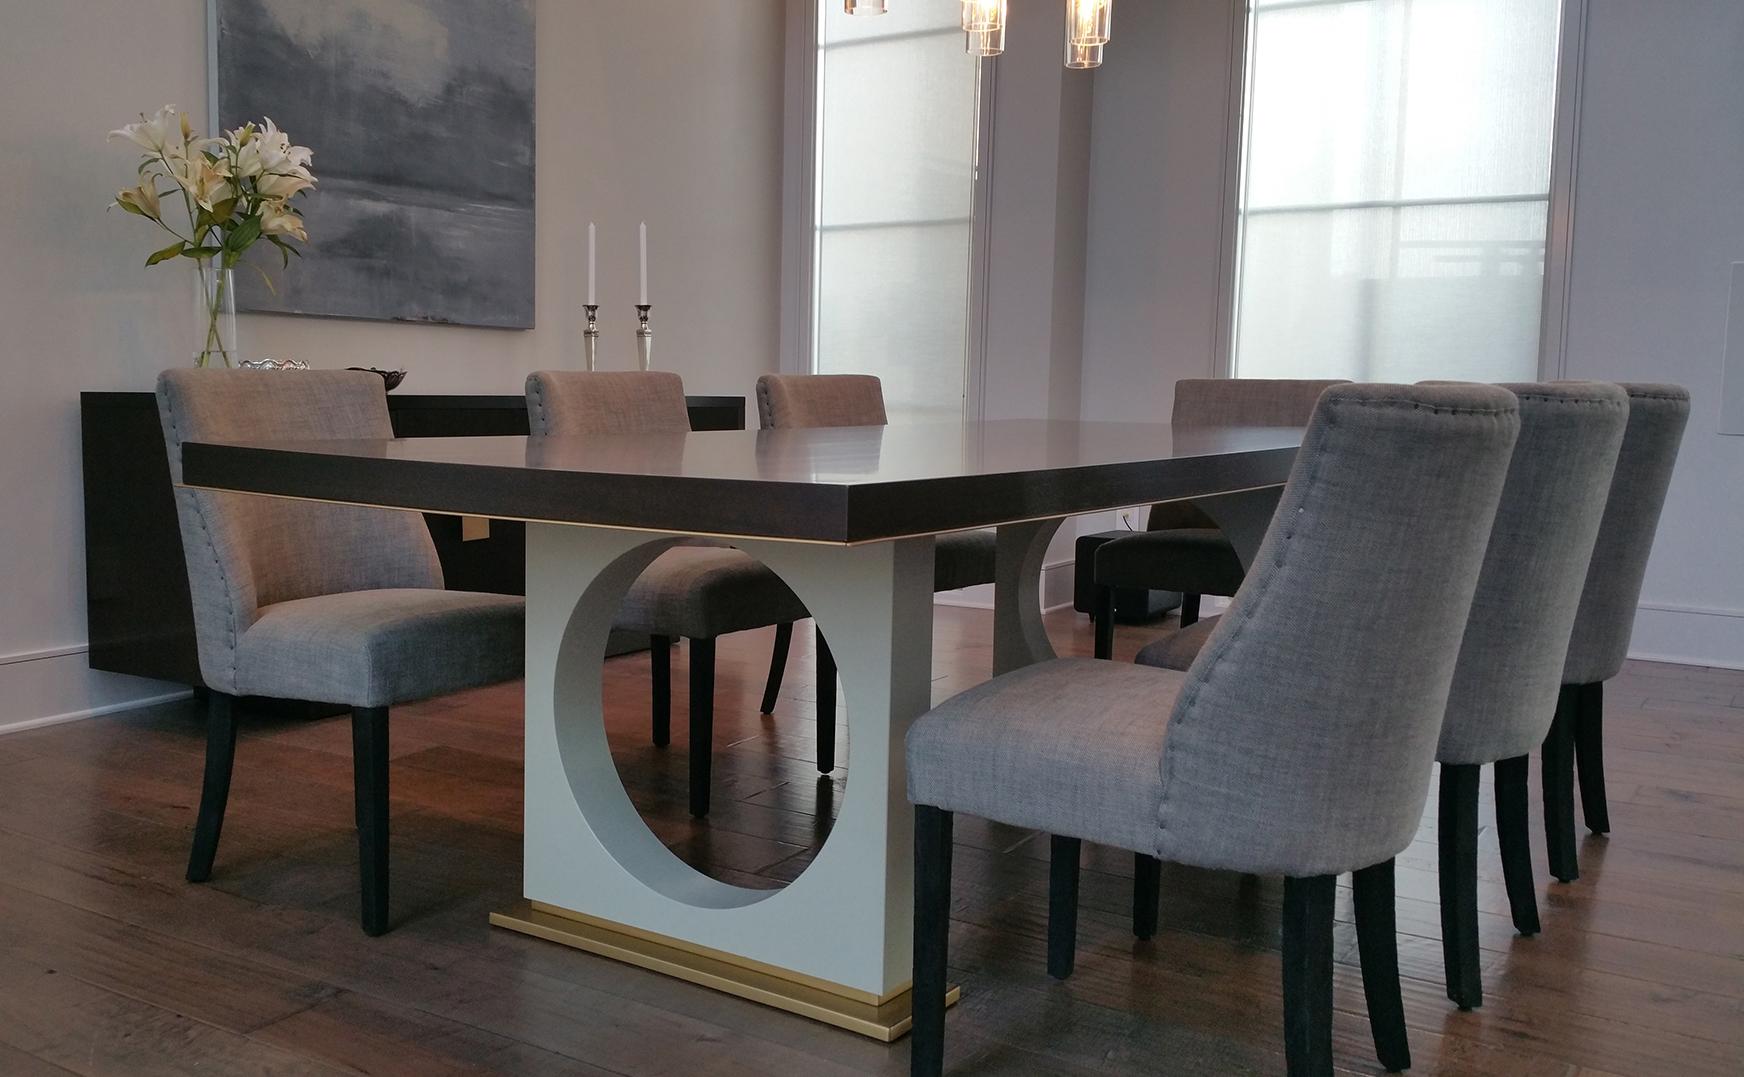 dining_table1_sm.jpg